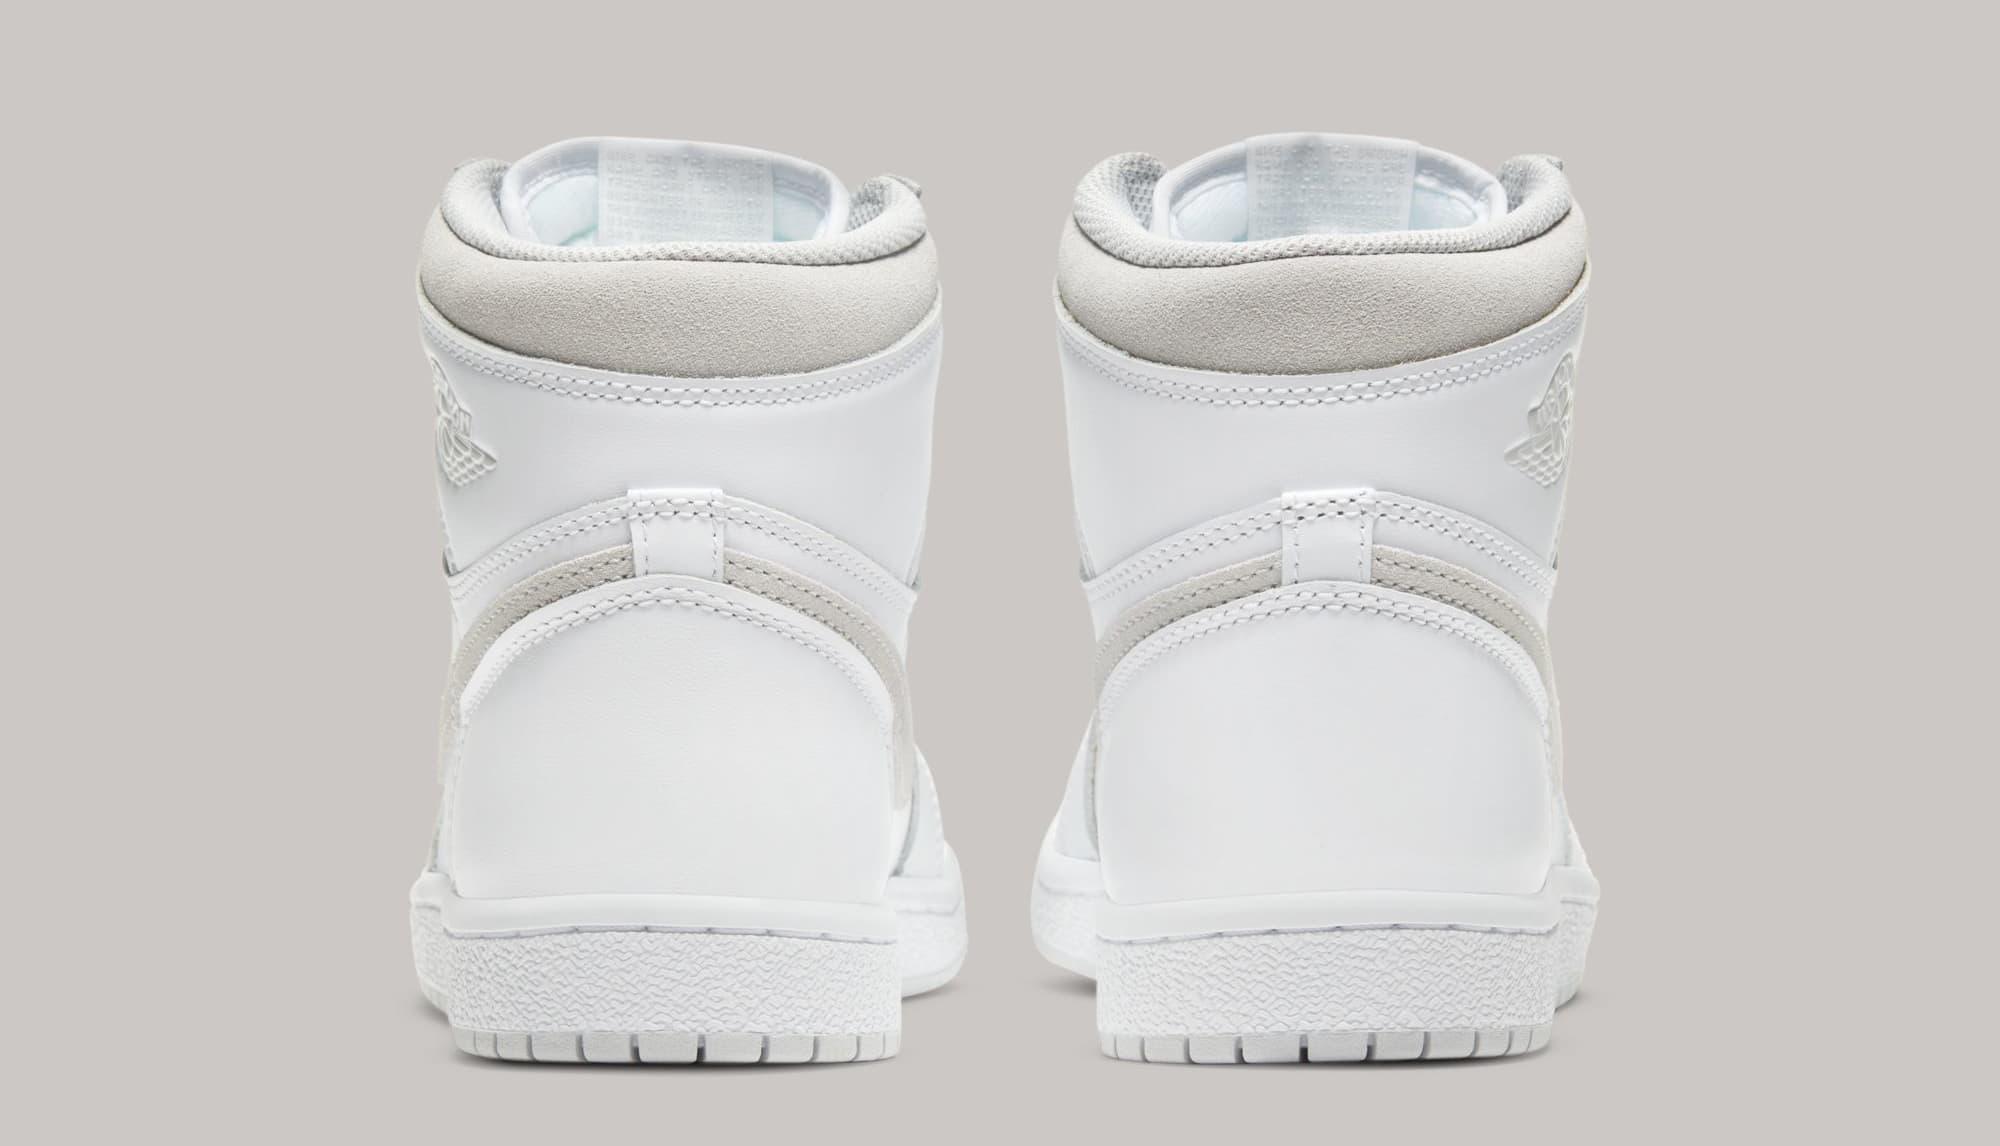 Air Jordan 1 High 85 'Neutral Grey' BQ4422-100 (Heel)